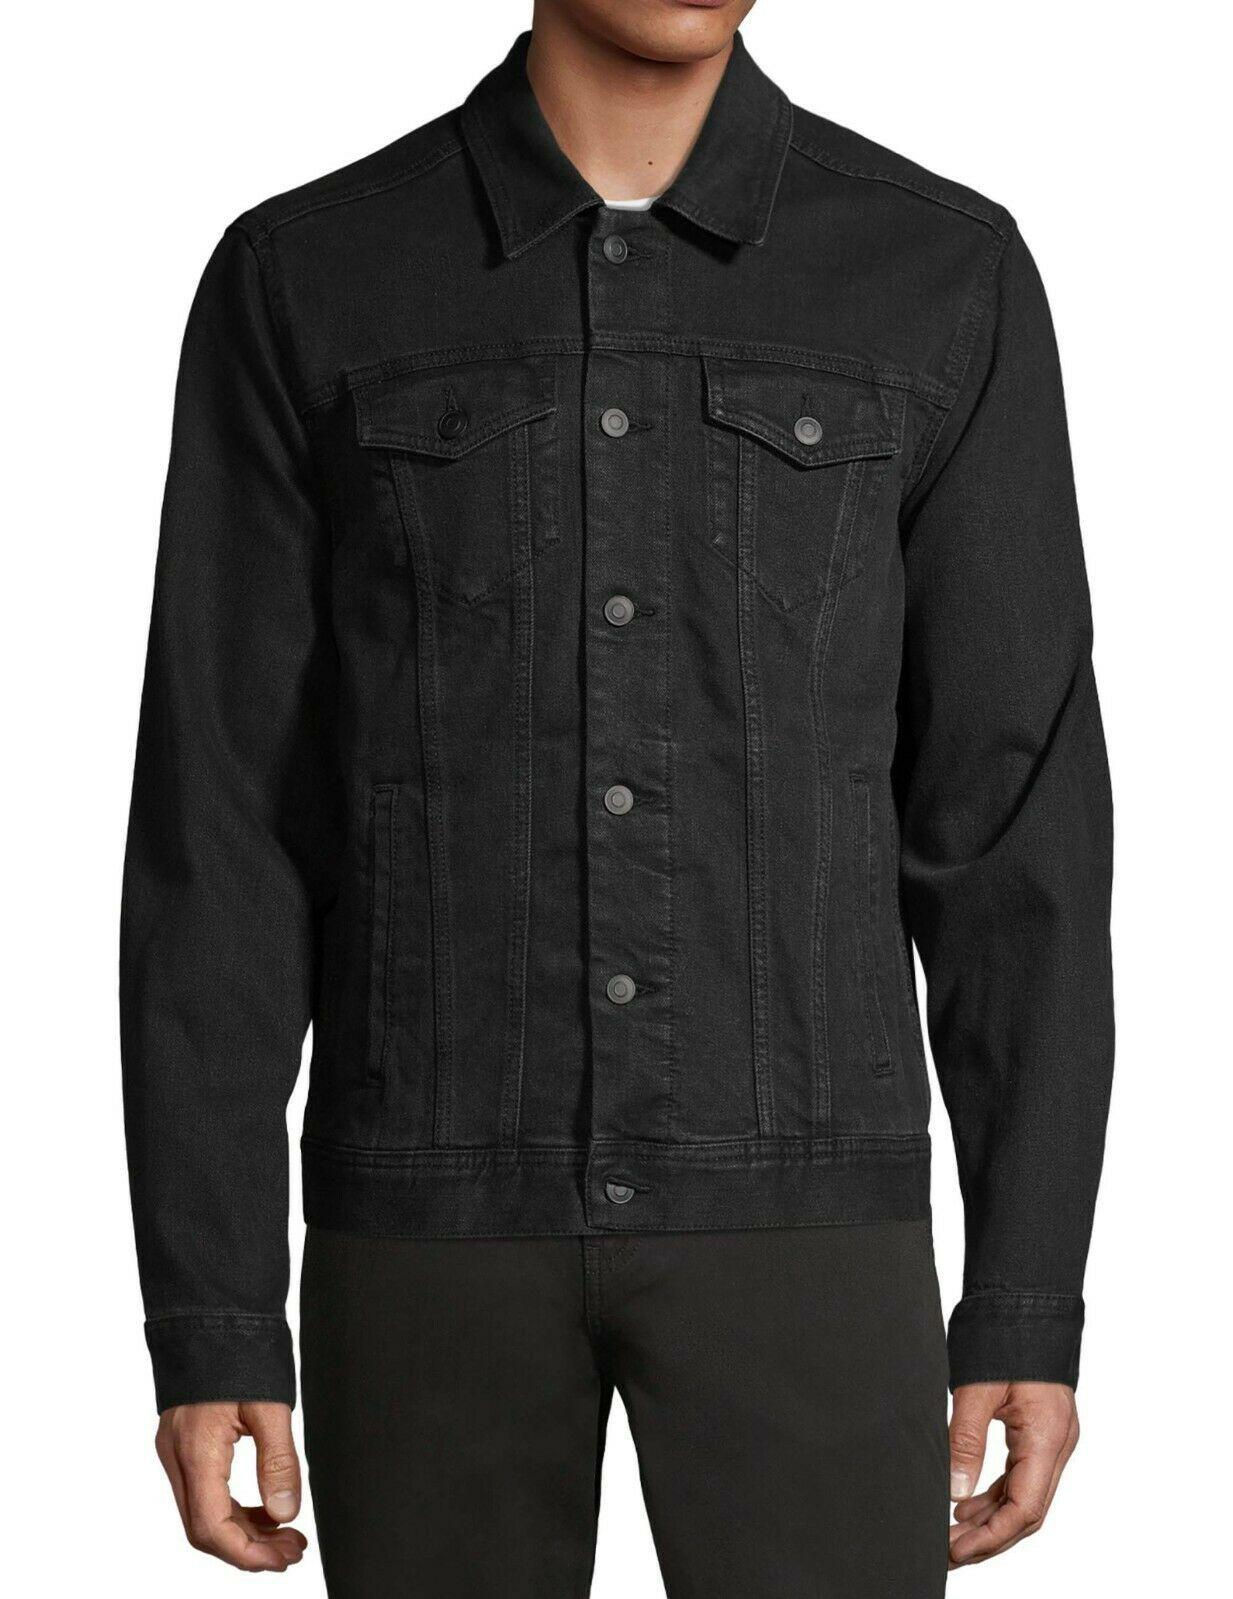 George Men's Classic Jean Button Flap Pockets Denim Trucker Jacket